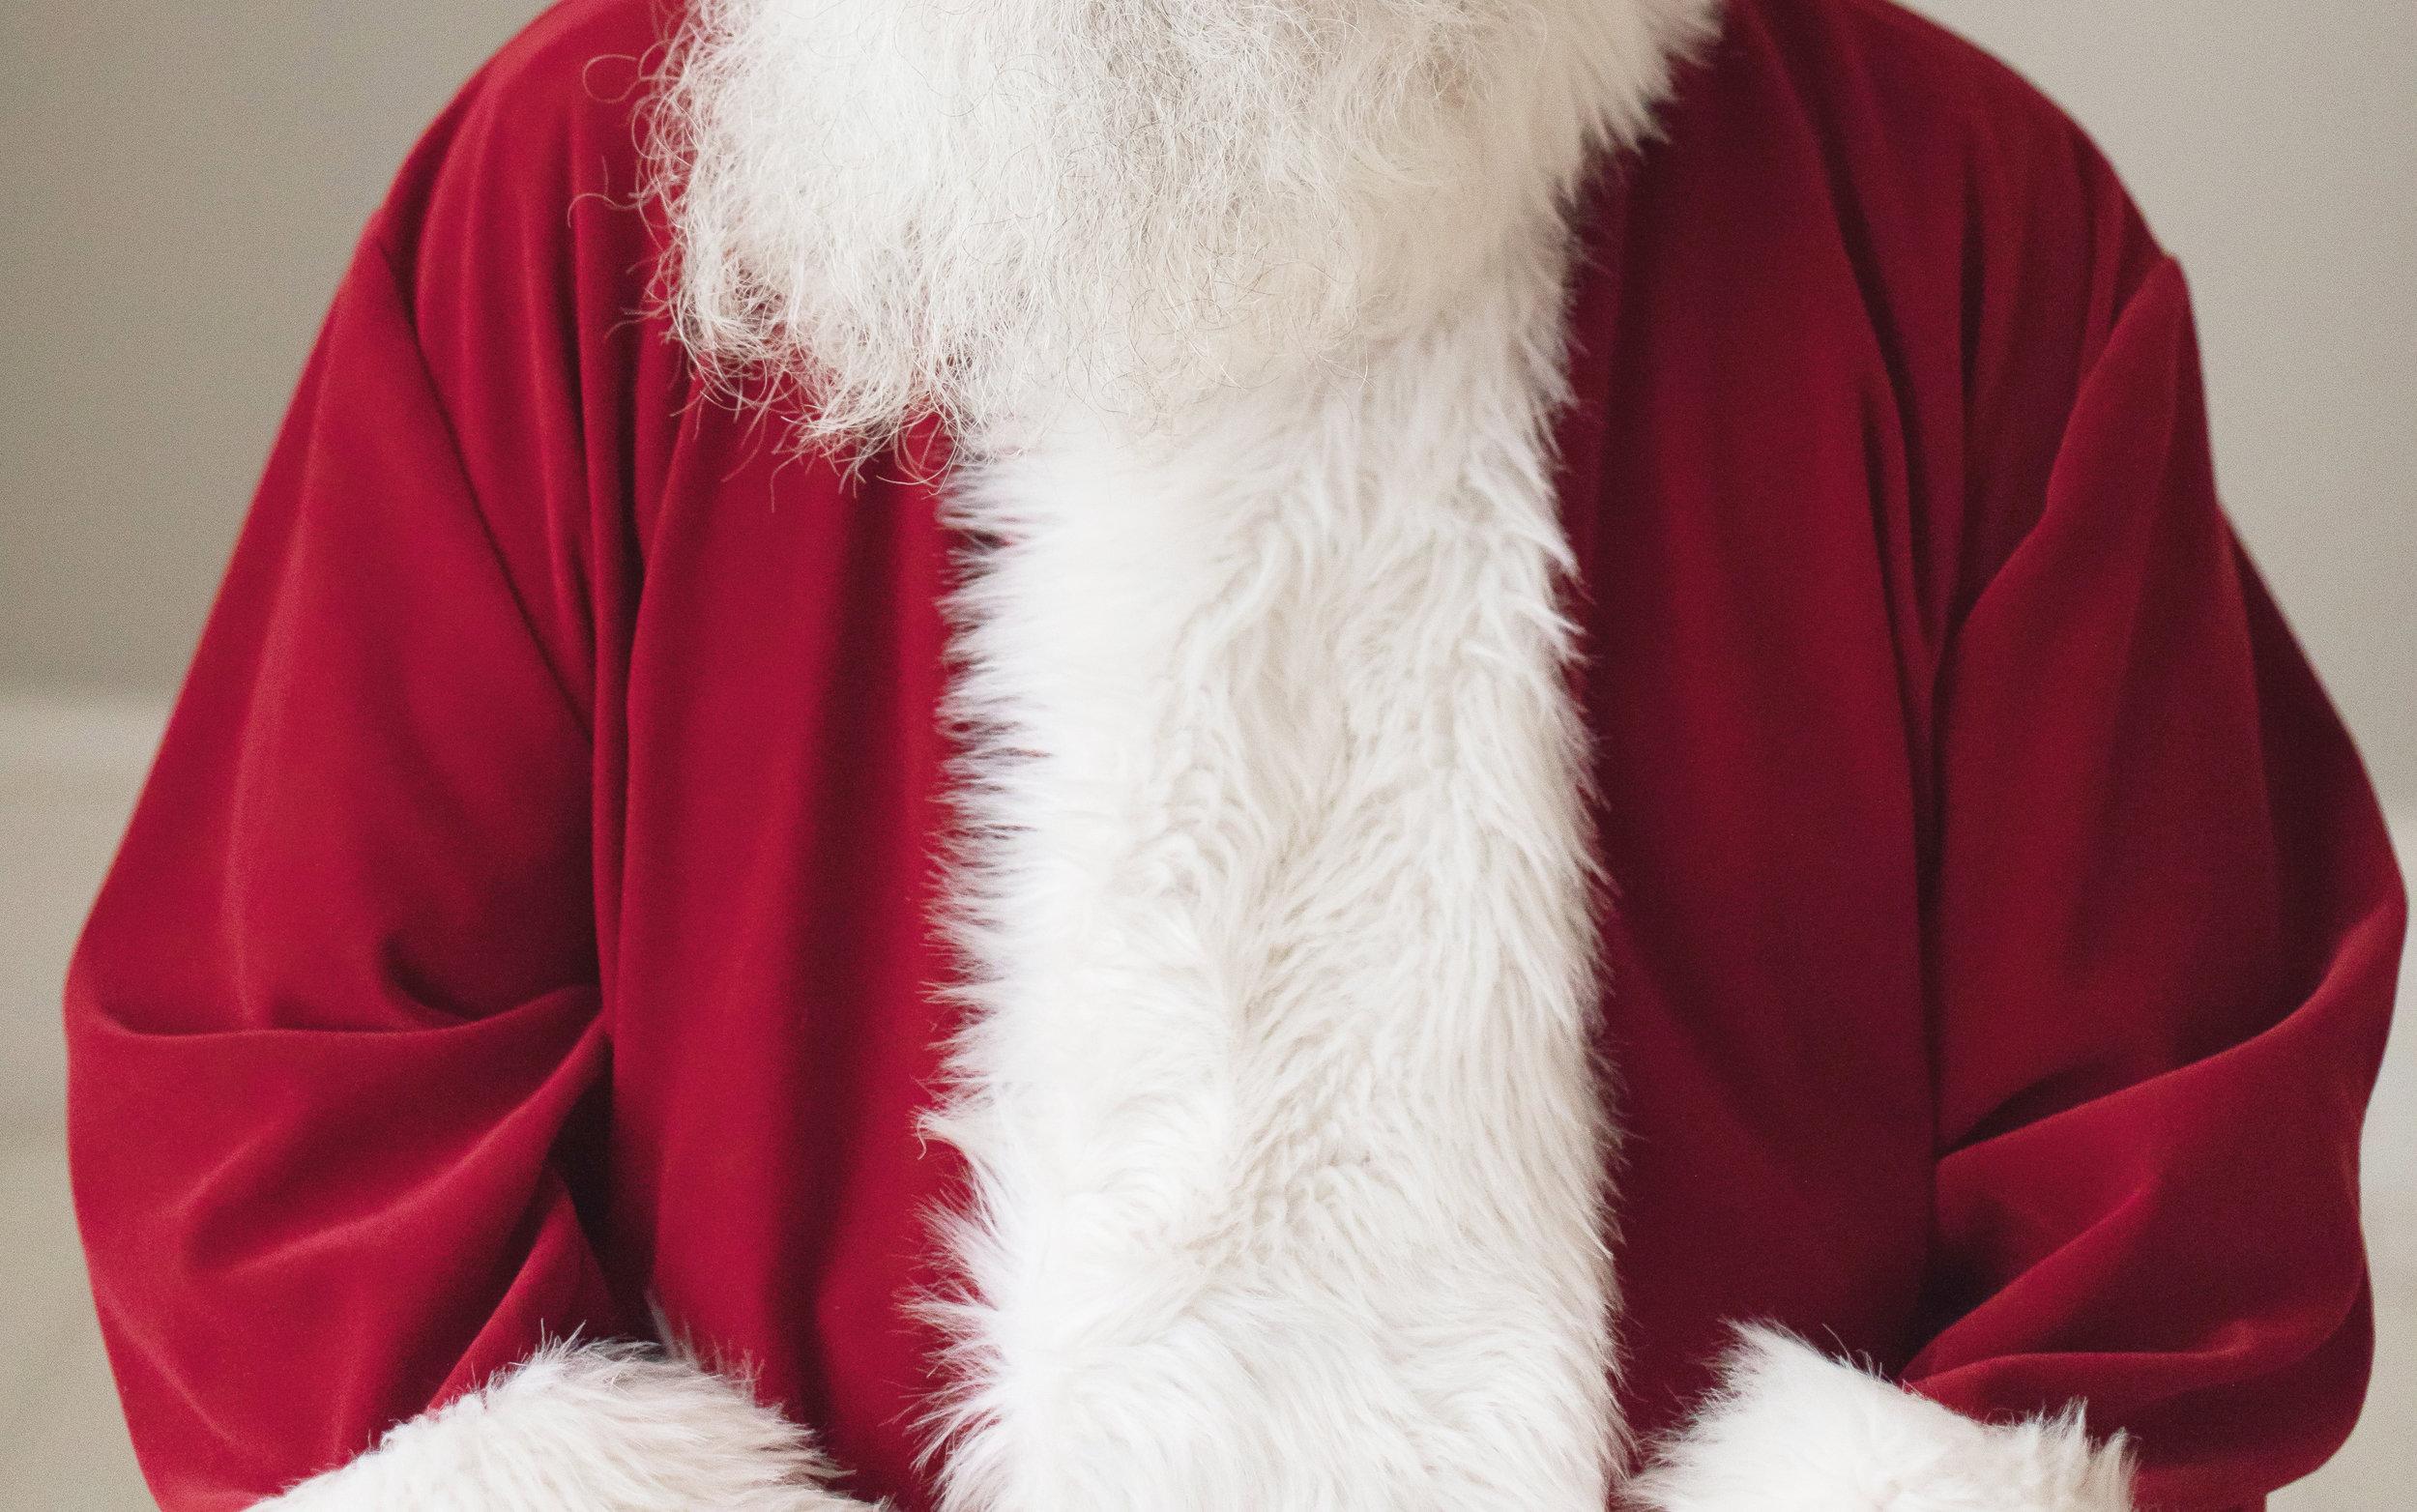 Petra_King_Photography_Santa_Sessions_Durham_Region_Christmas_Photographer